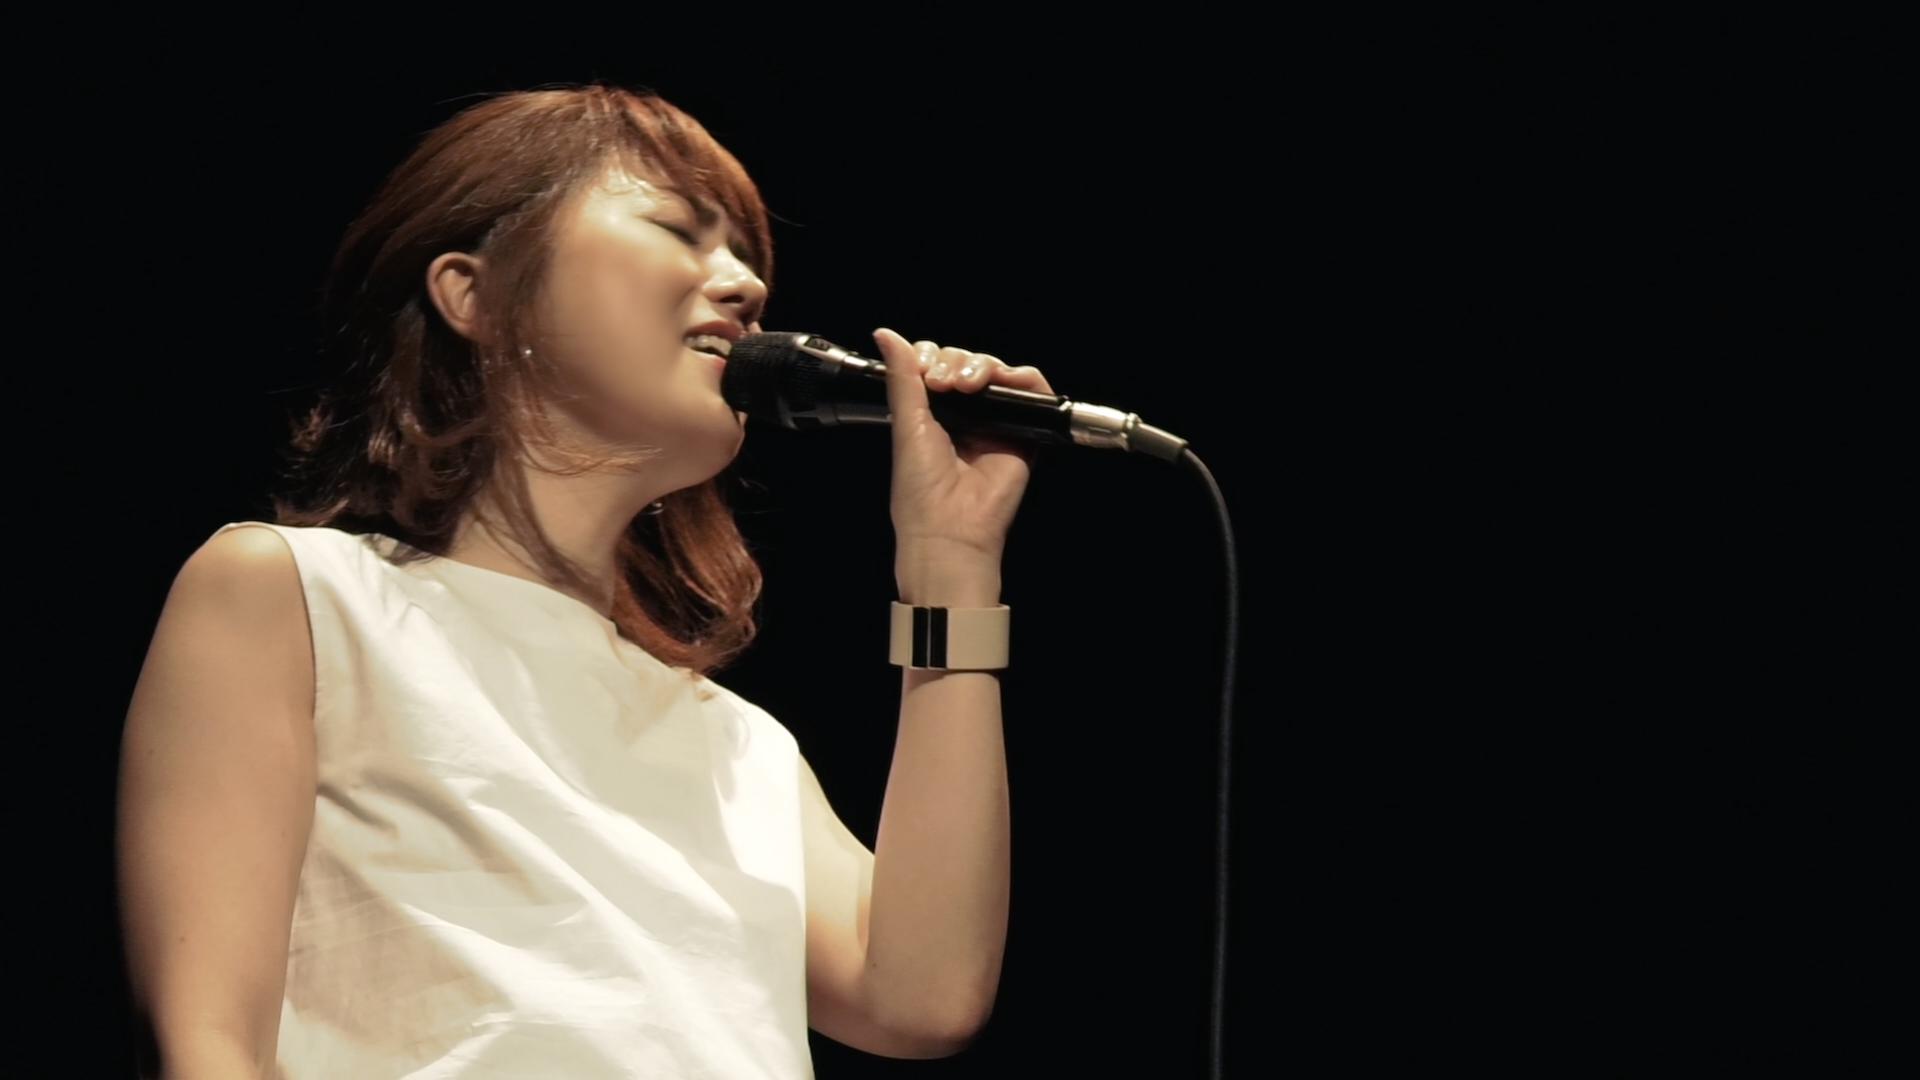 熊木杏里-LIVE TOUR 2016